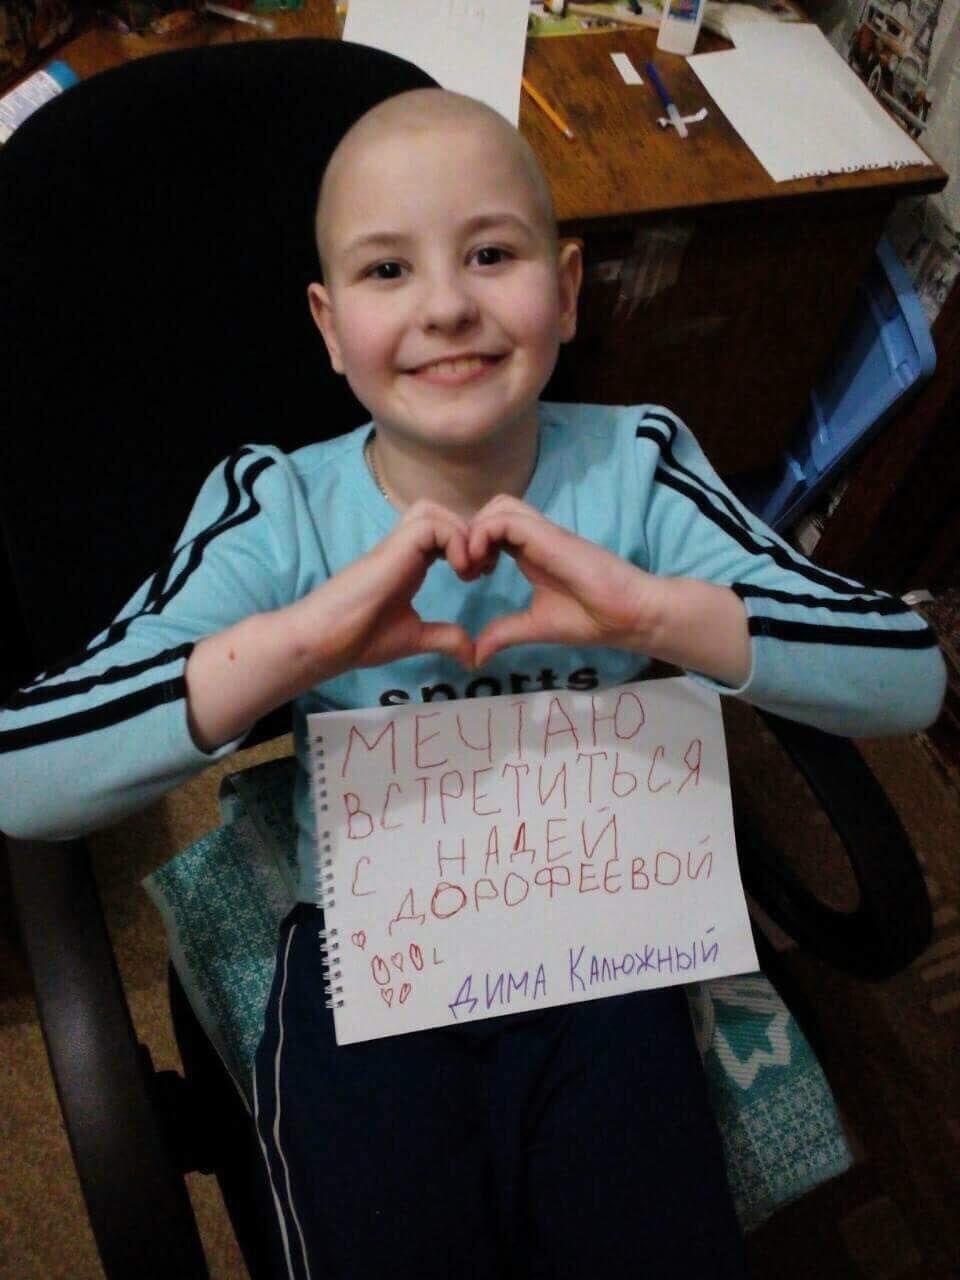 Дорофєєва привітала Дмитрика Калюжного_1